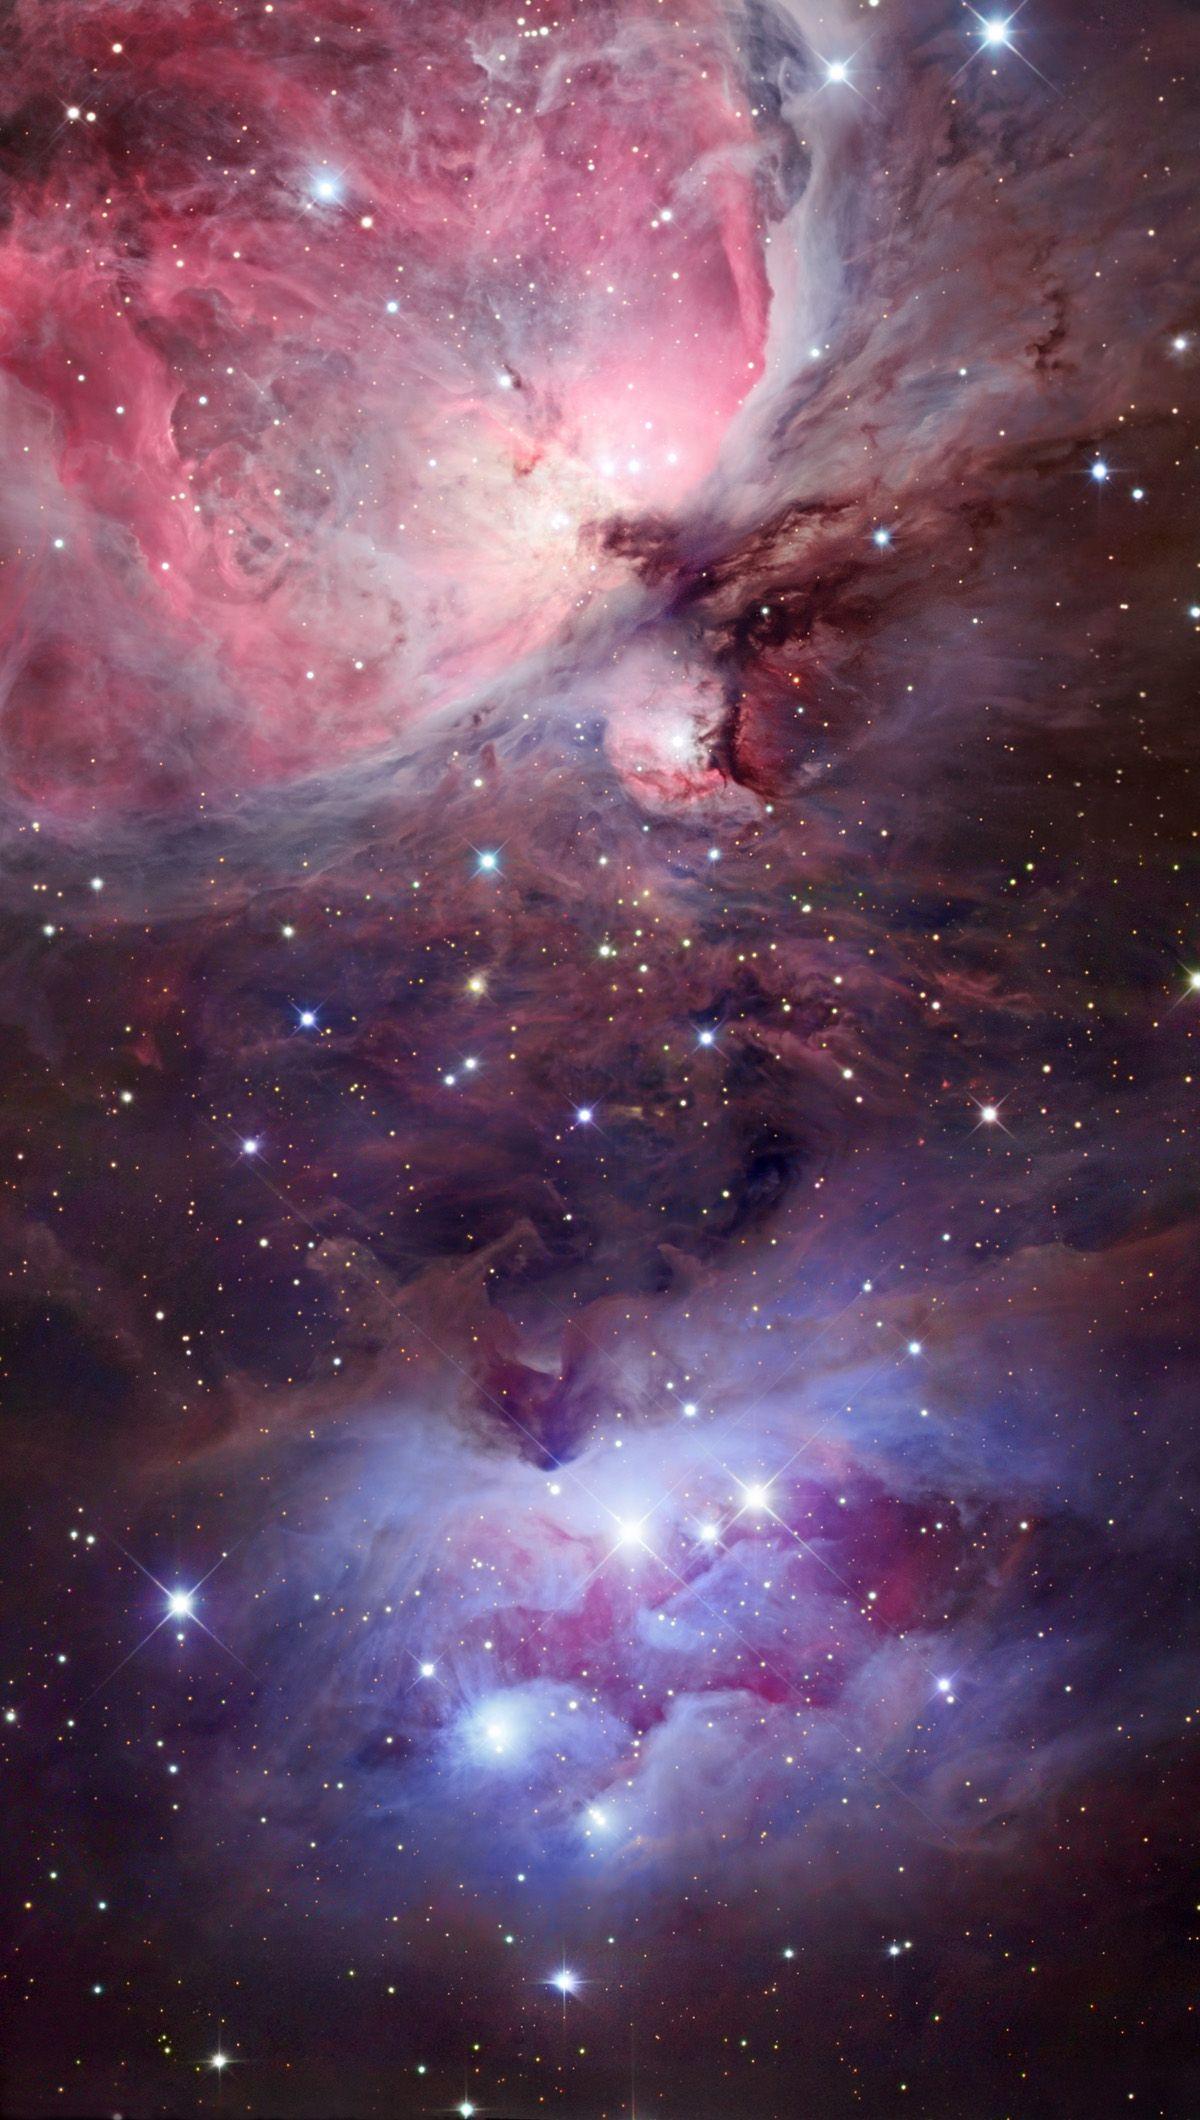 pincrystal sanchez on beautiful space | pinterest | astronomy